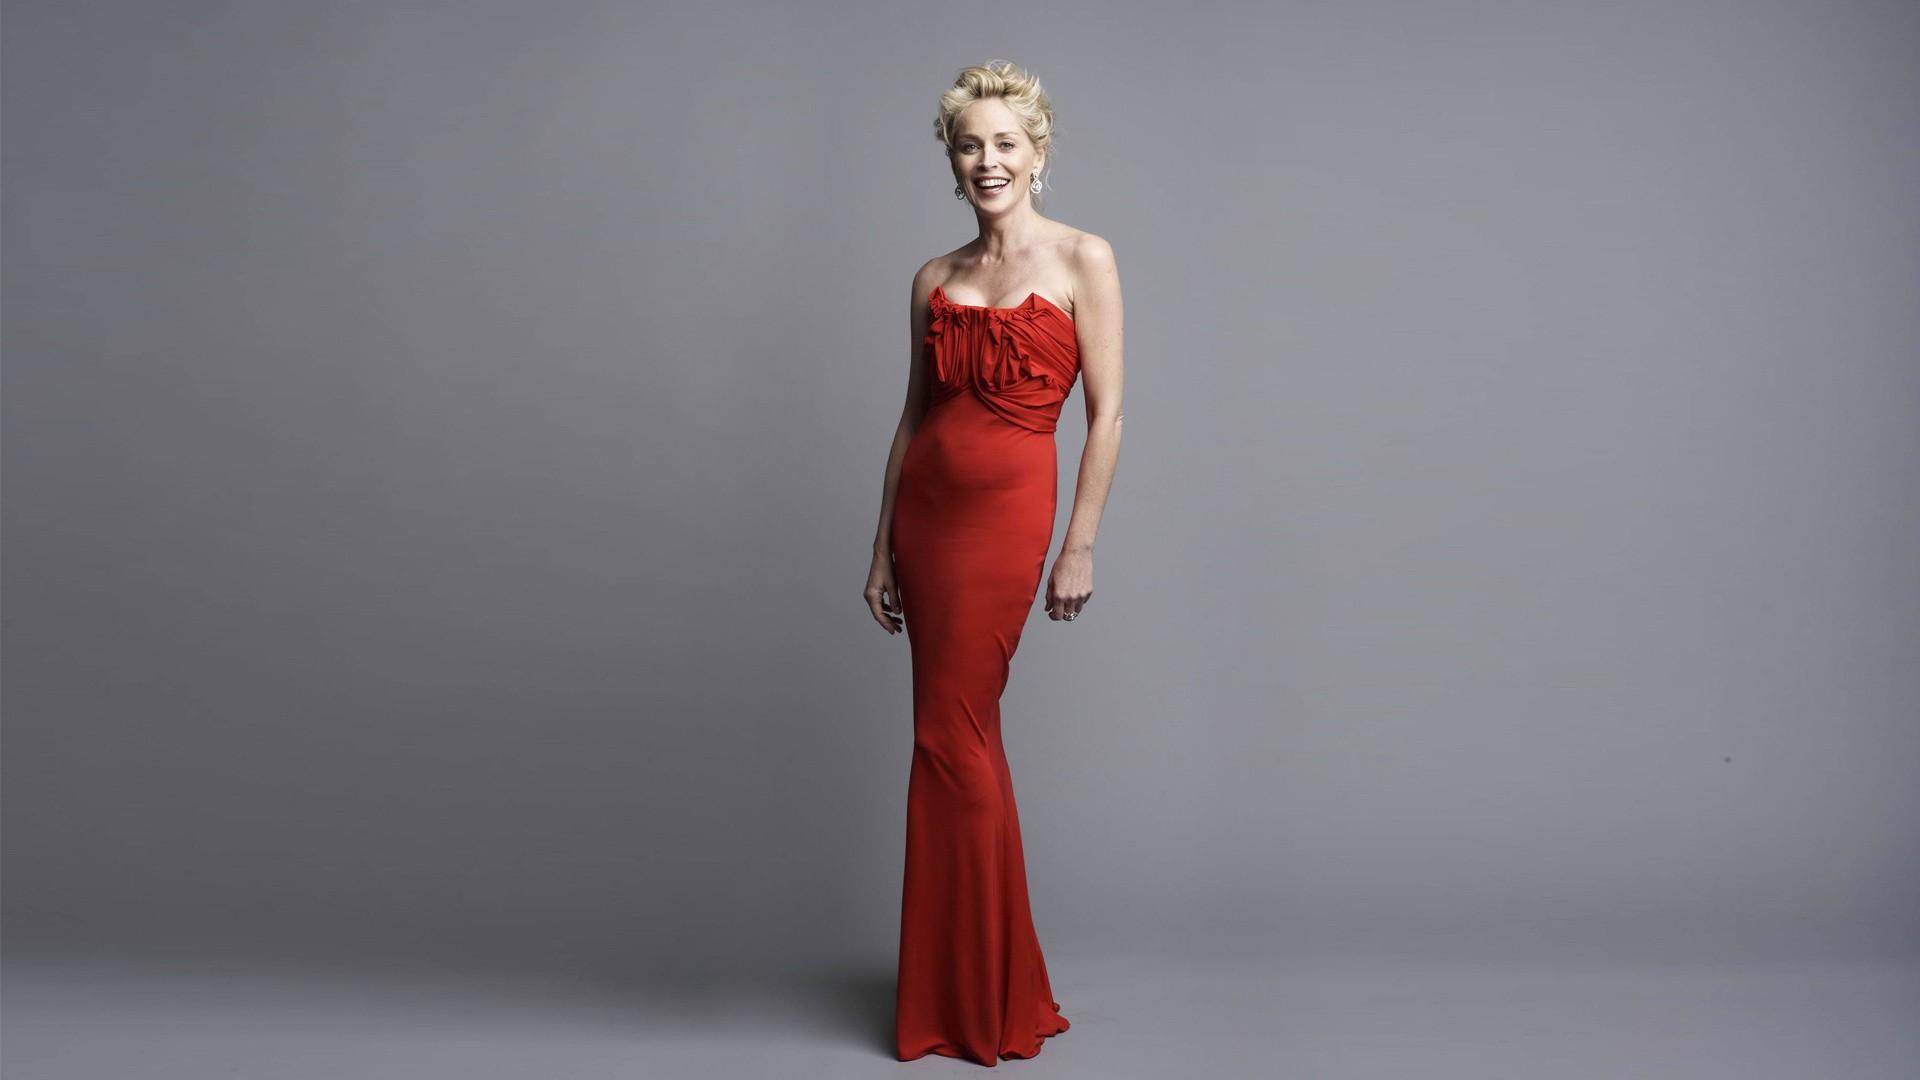 Red Dress Wallpaper HD